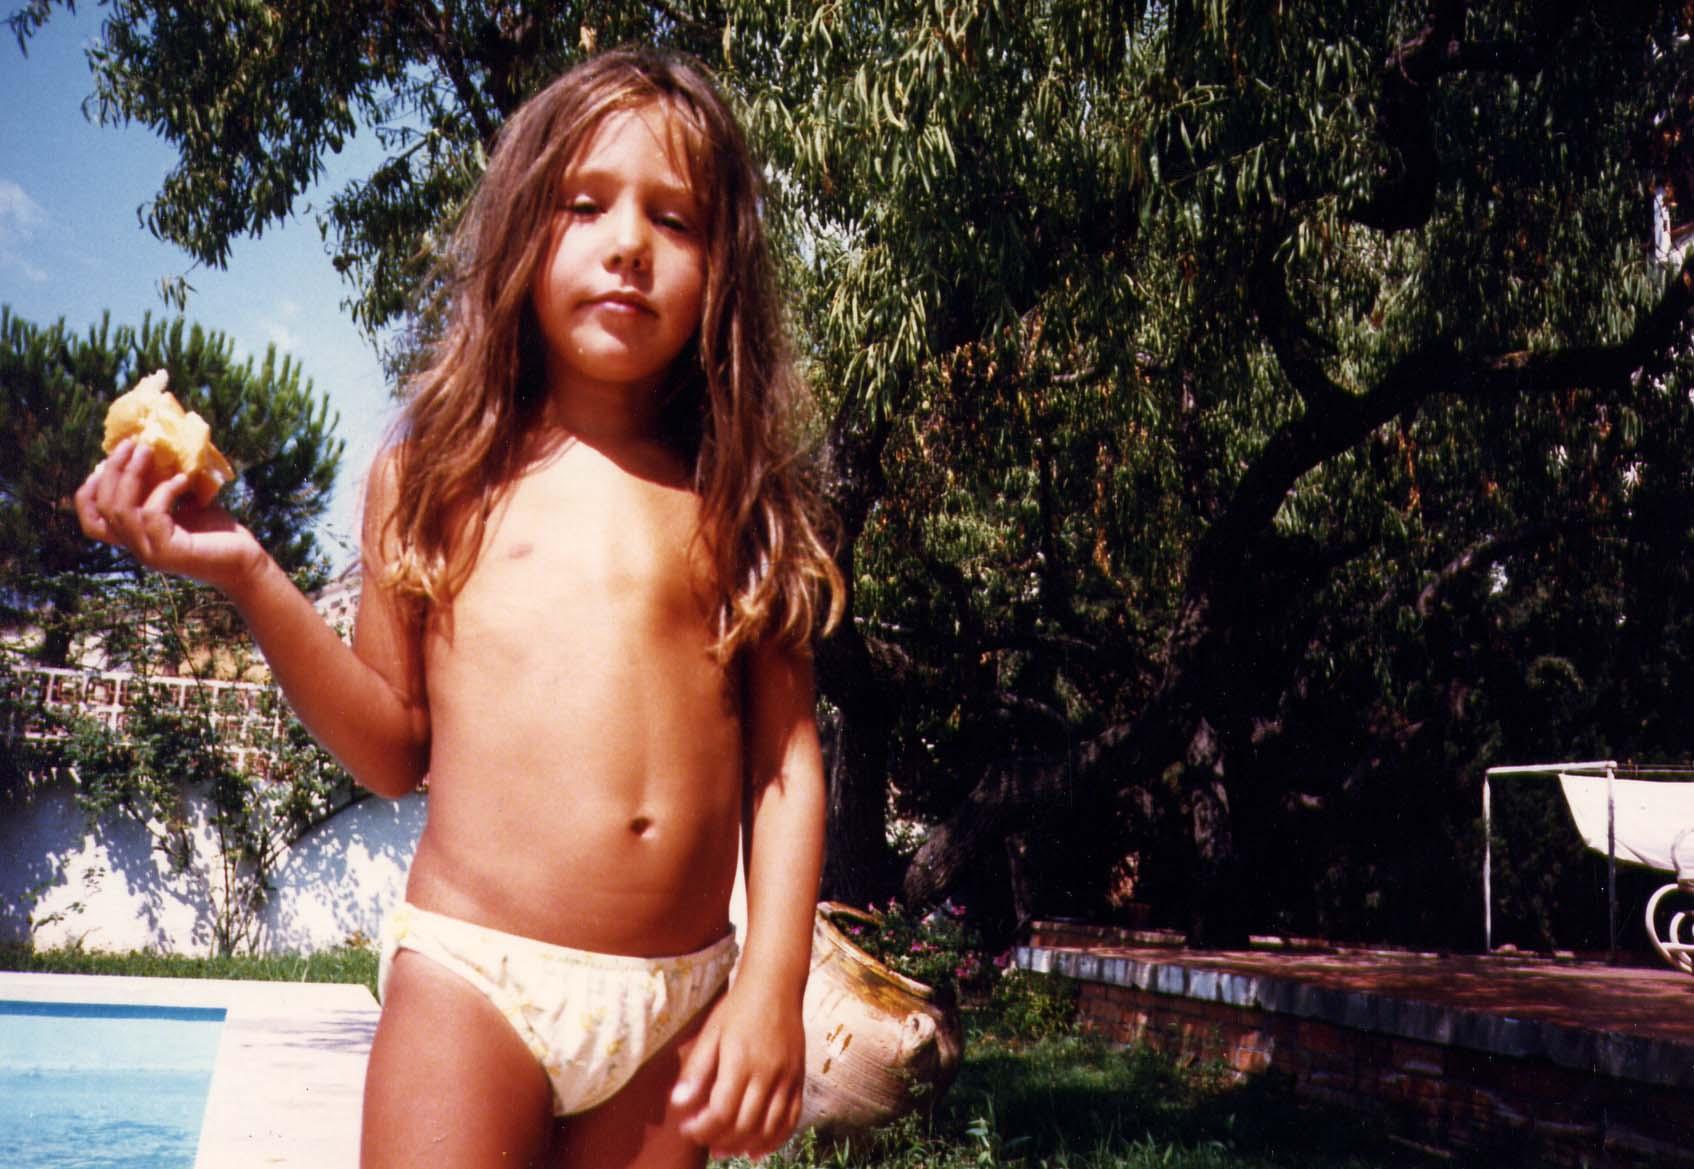 Jo amb 5 anys